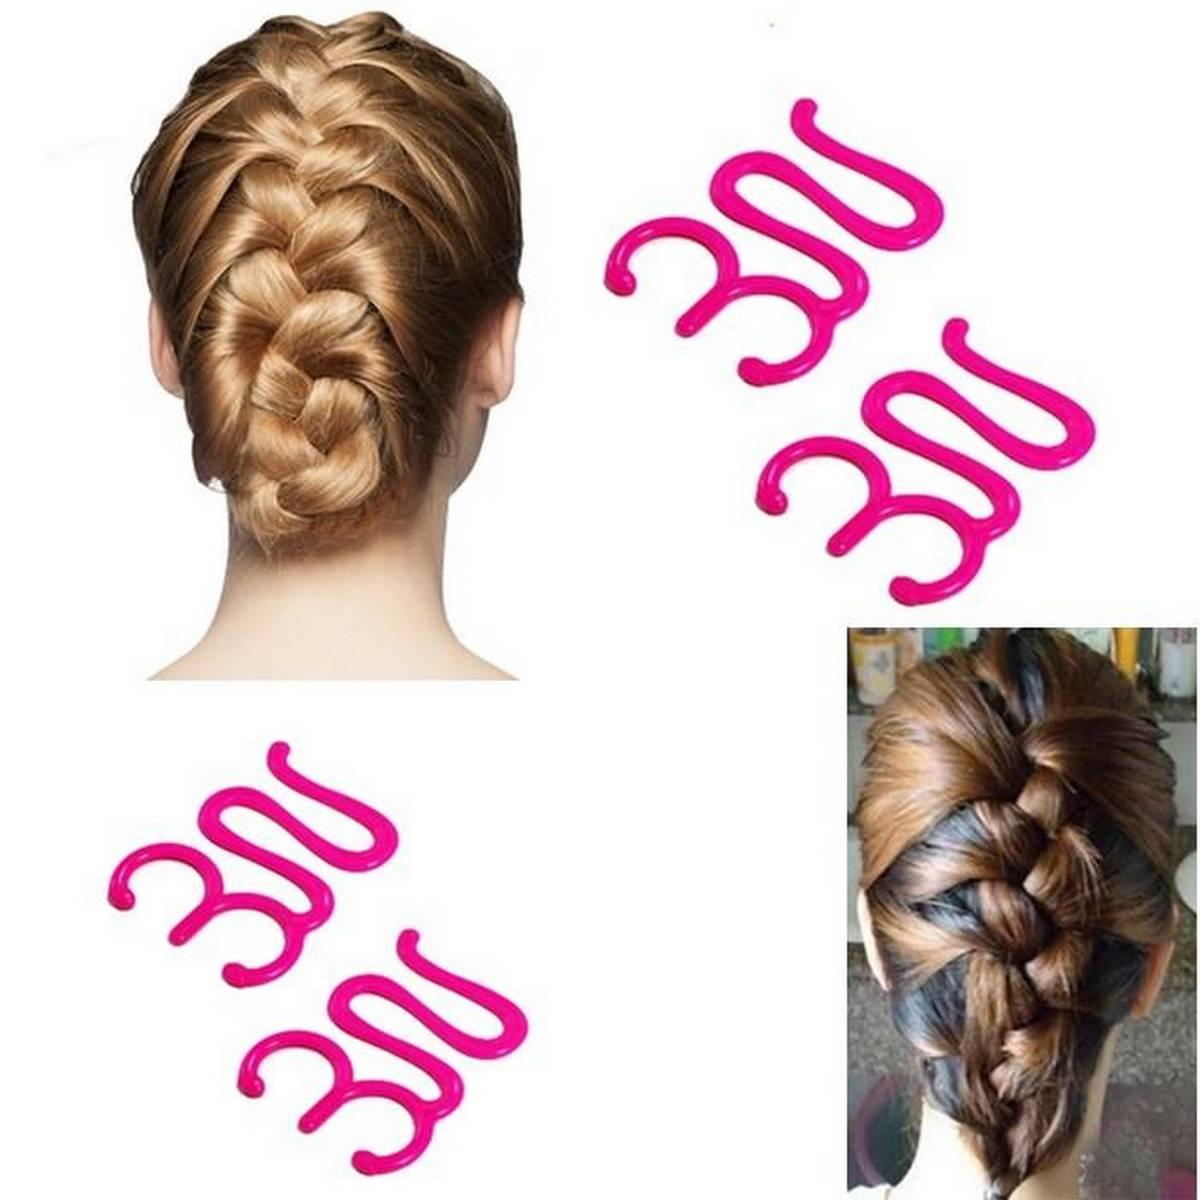 NEW FASHION! Lady French Hair Braiding Tool Weave Sponge Plait hair Twist Hairstyling Braider DIY Accessories